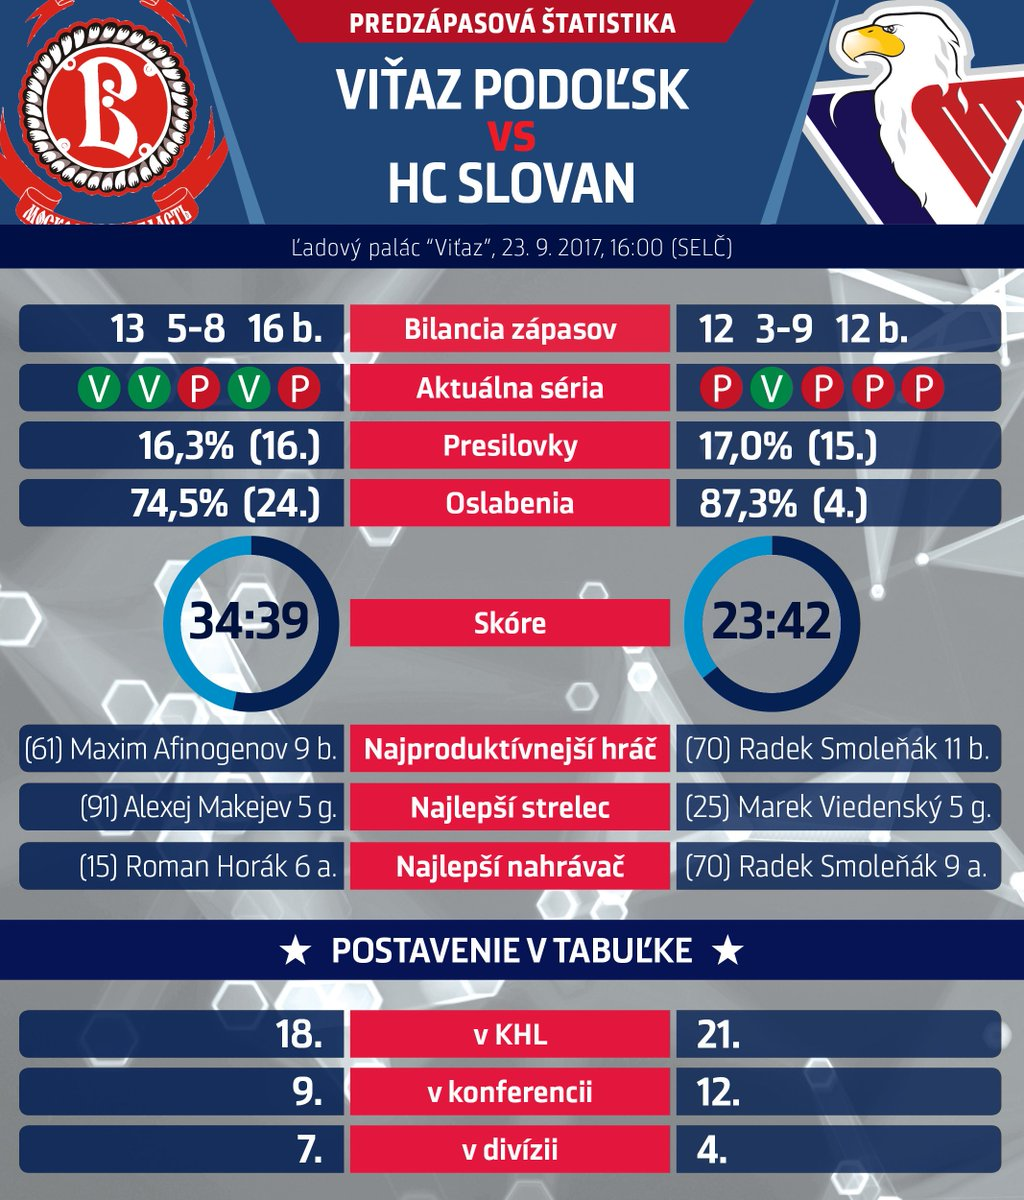 Pre game stats and match up @hcvityaz_khl vs #hcslovan Faceoff 16:00 (CEST) @khl #VerniSlovanu https://t.co/efRdKtMXzX